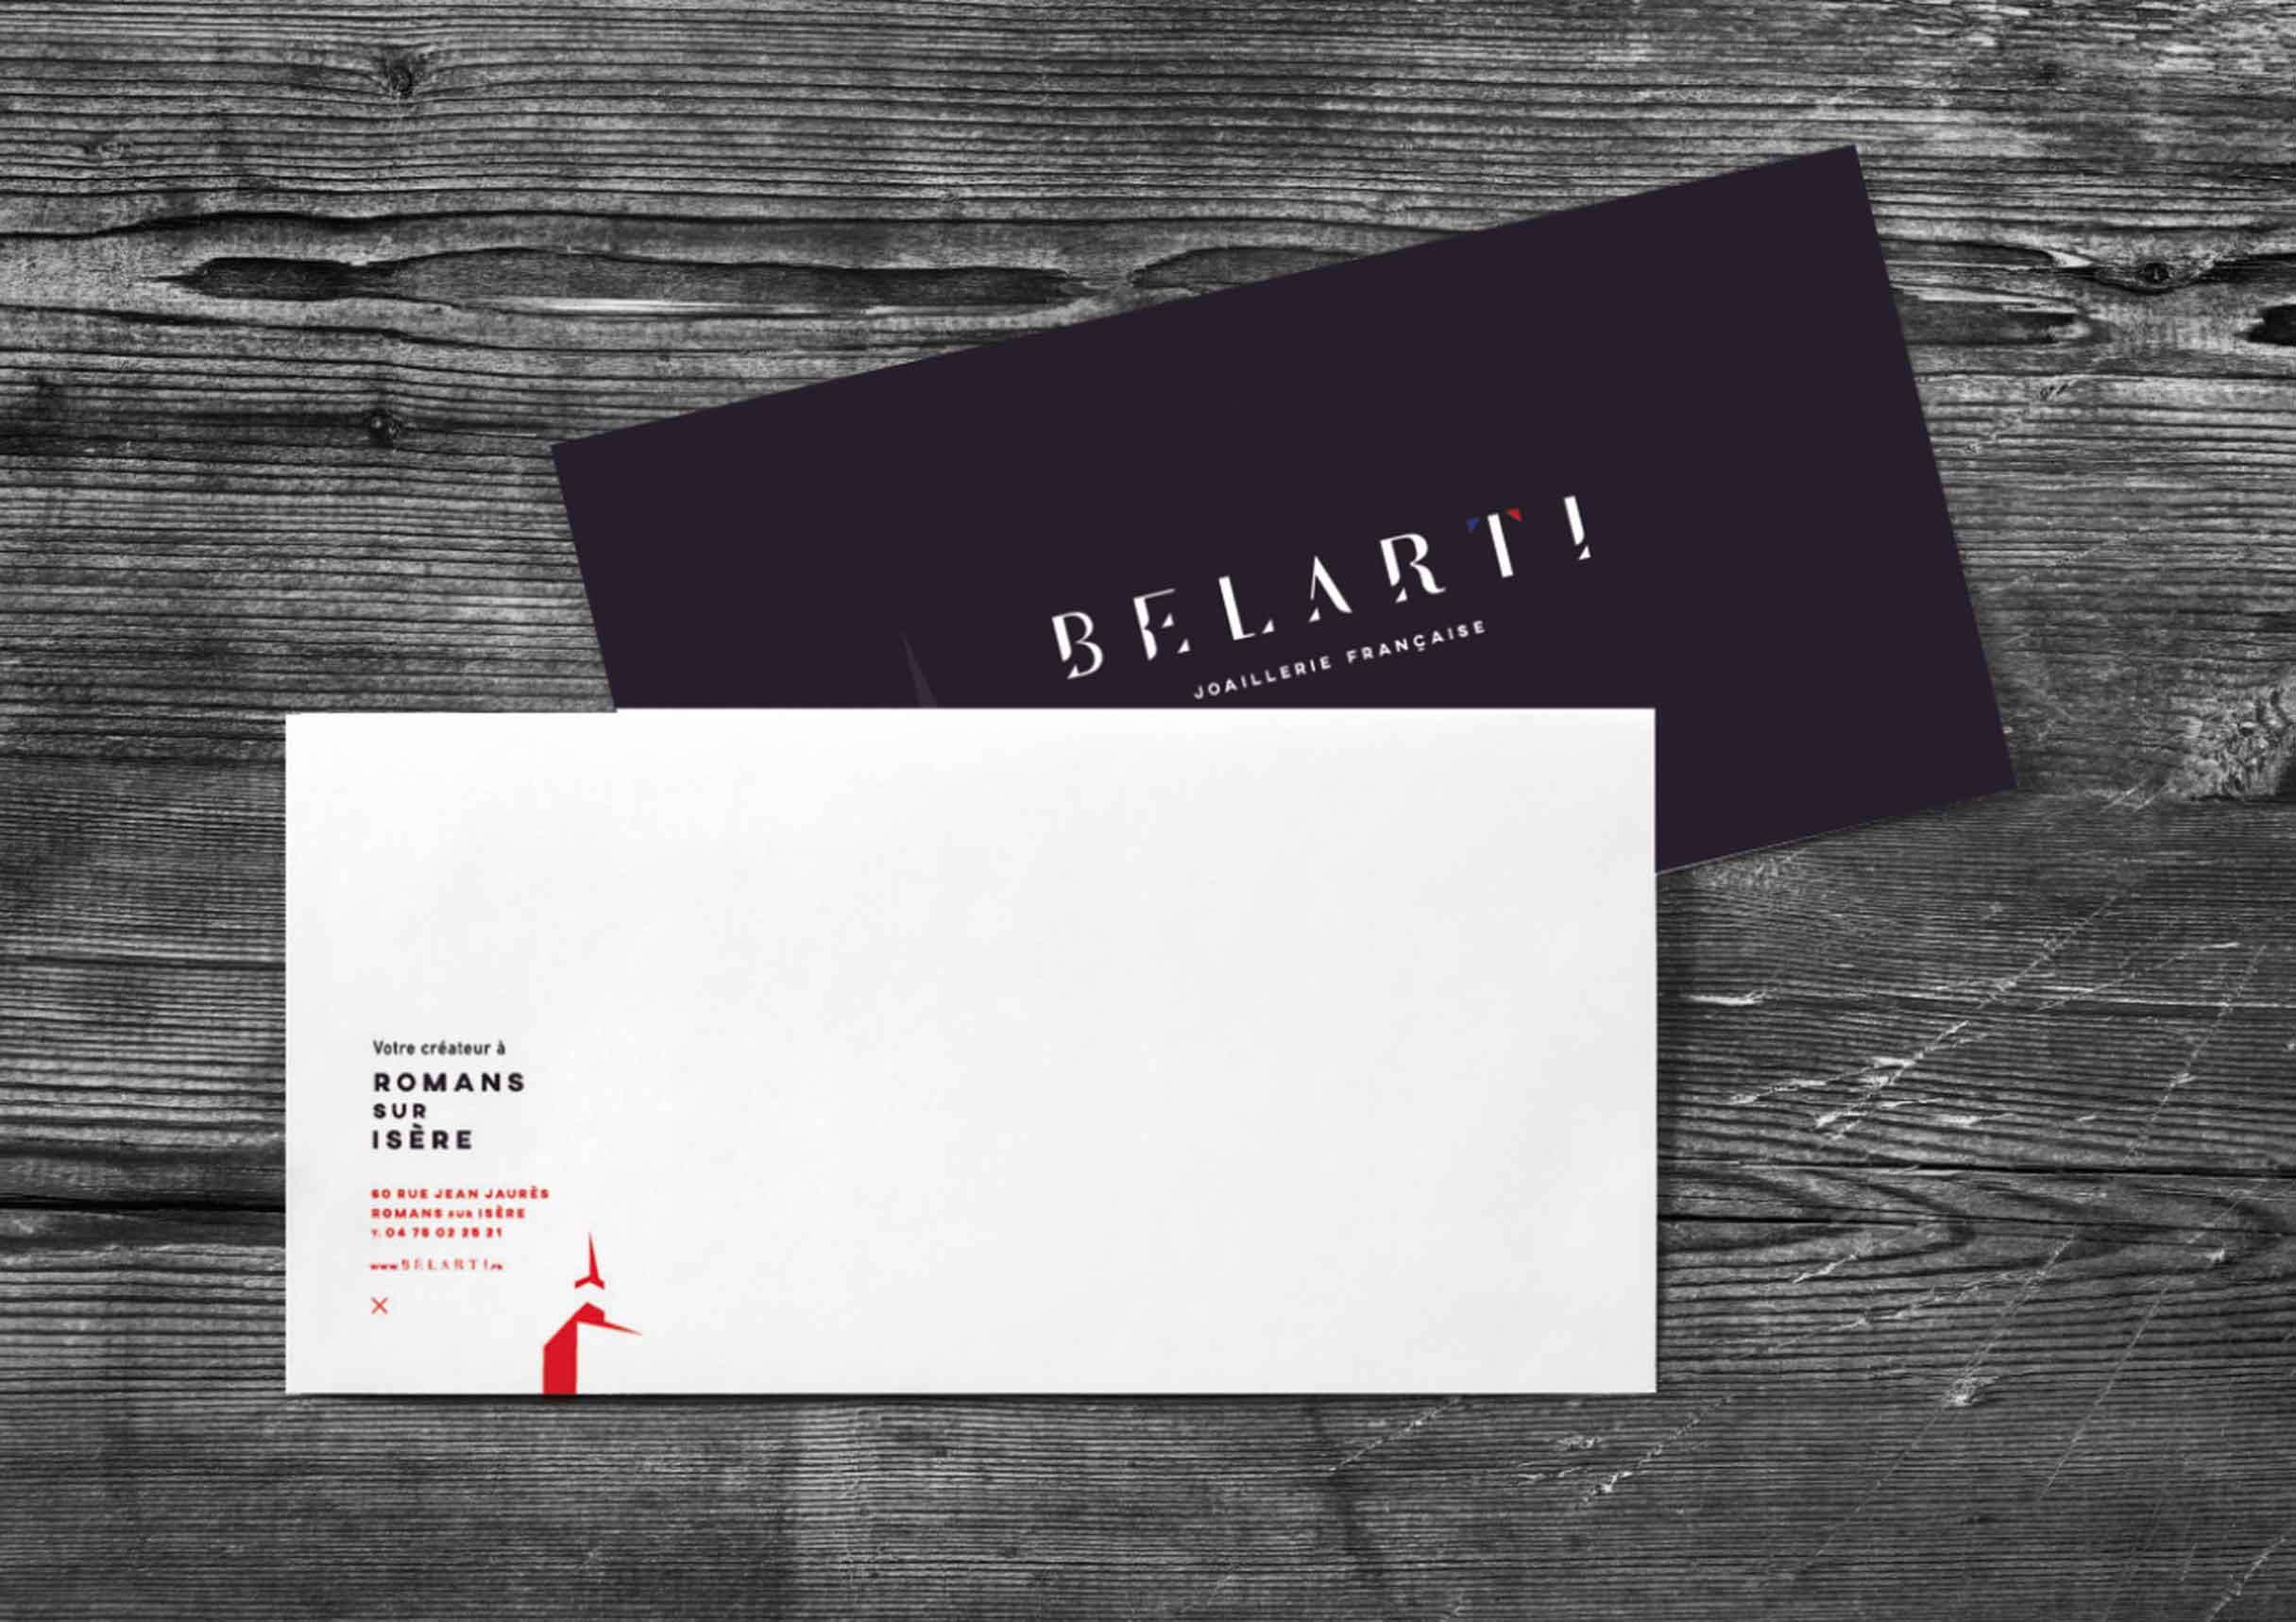 reference_belarti_5